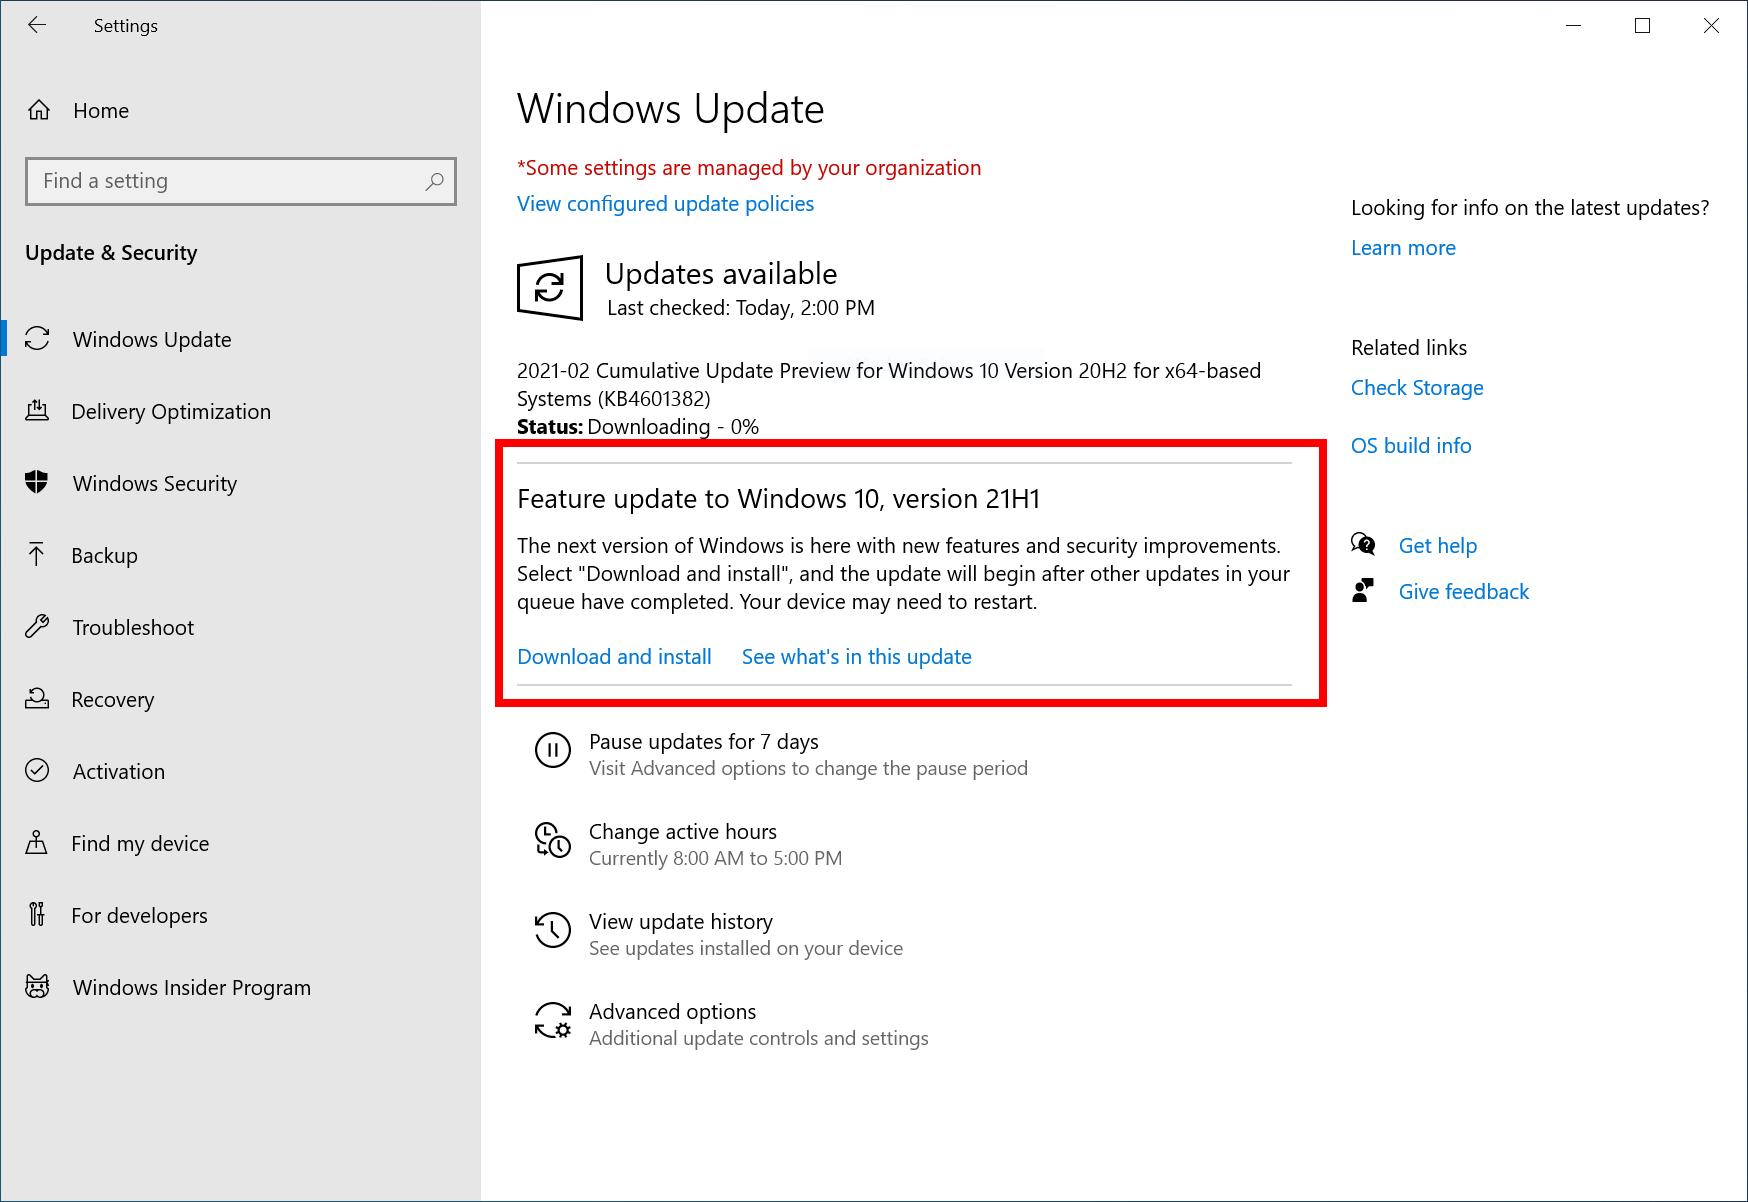 「Windows 10」の次期機能アップデート「バージョン 21H1」を発表